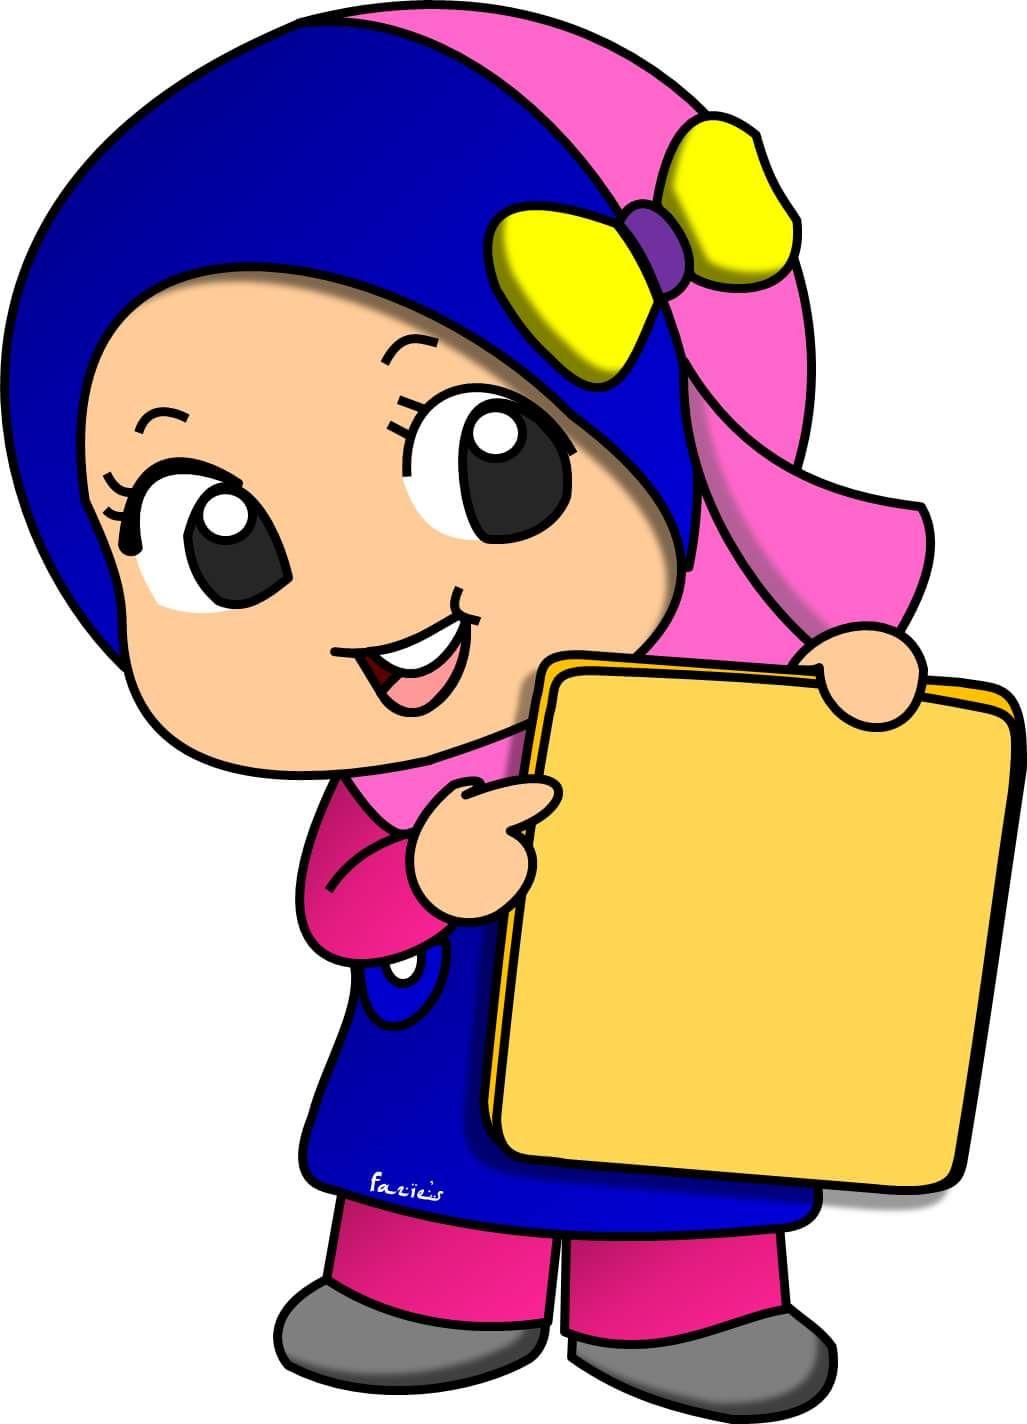 13316785 1062819287141650 4951568082864510499 o png jpg 1027 1424 rh pinterest com islamic clip art islamic clip art